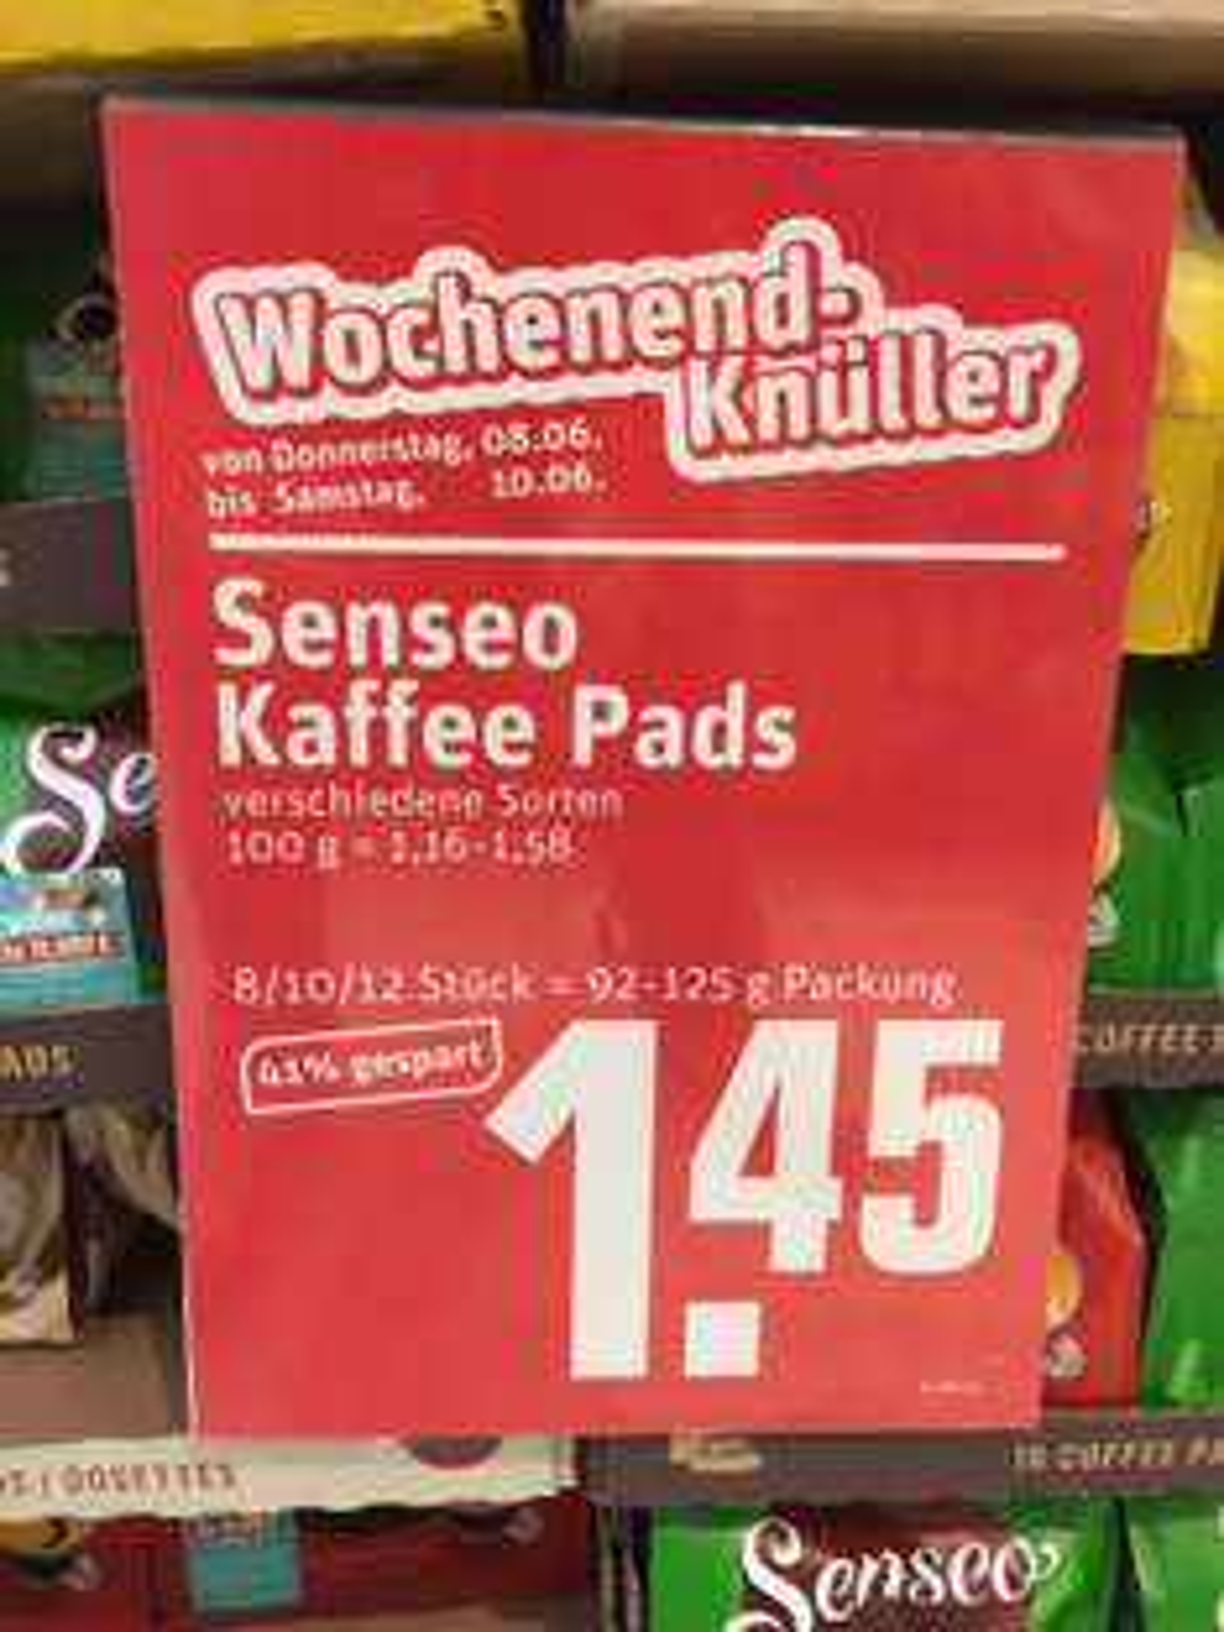 [REWE] Senseo Kaffee Pads